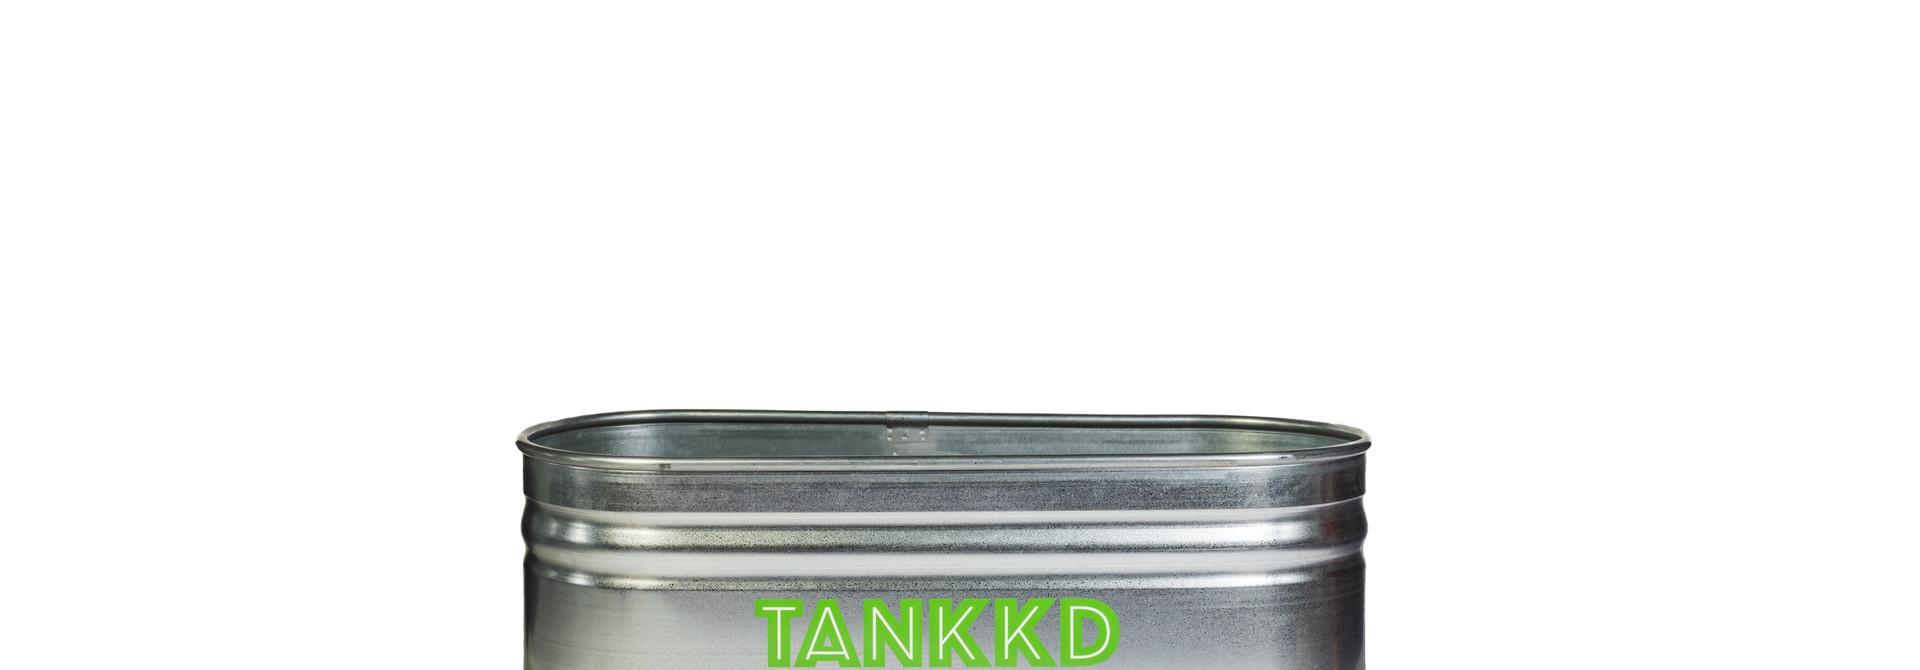 Tankkd Eskimo pack basic